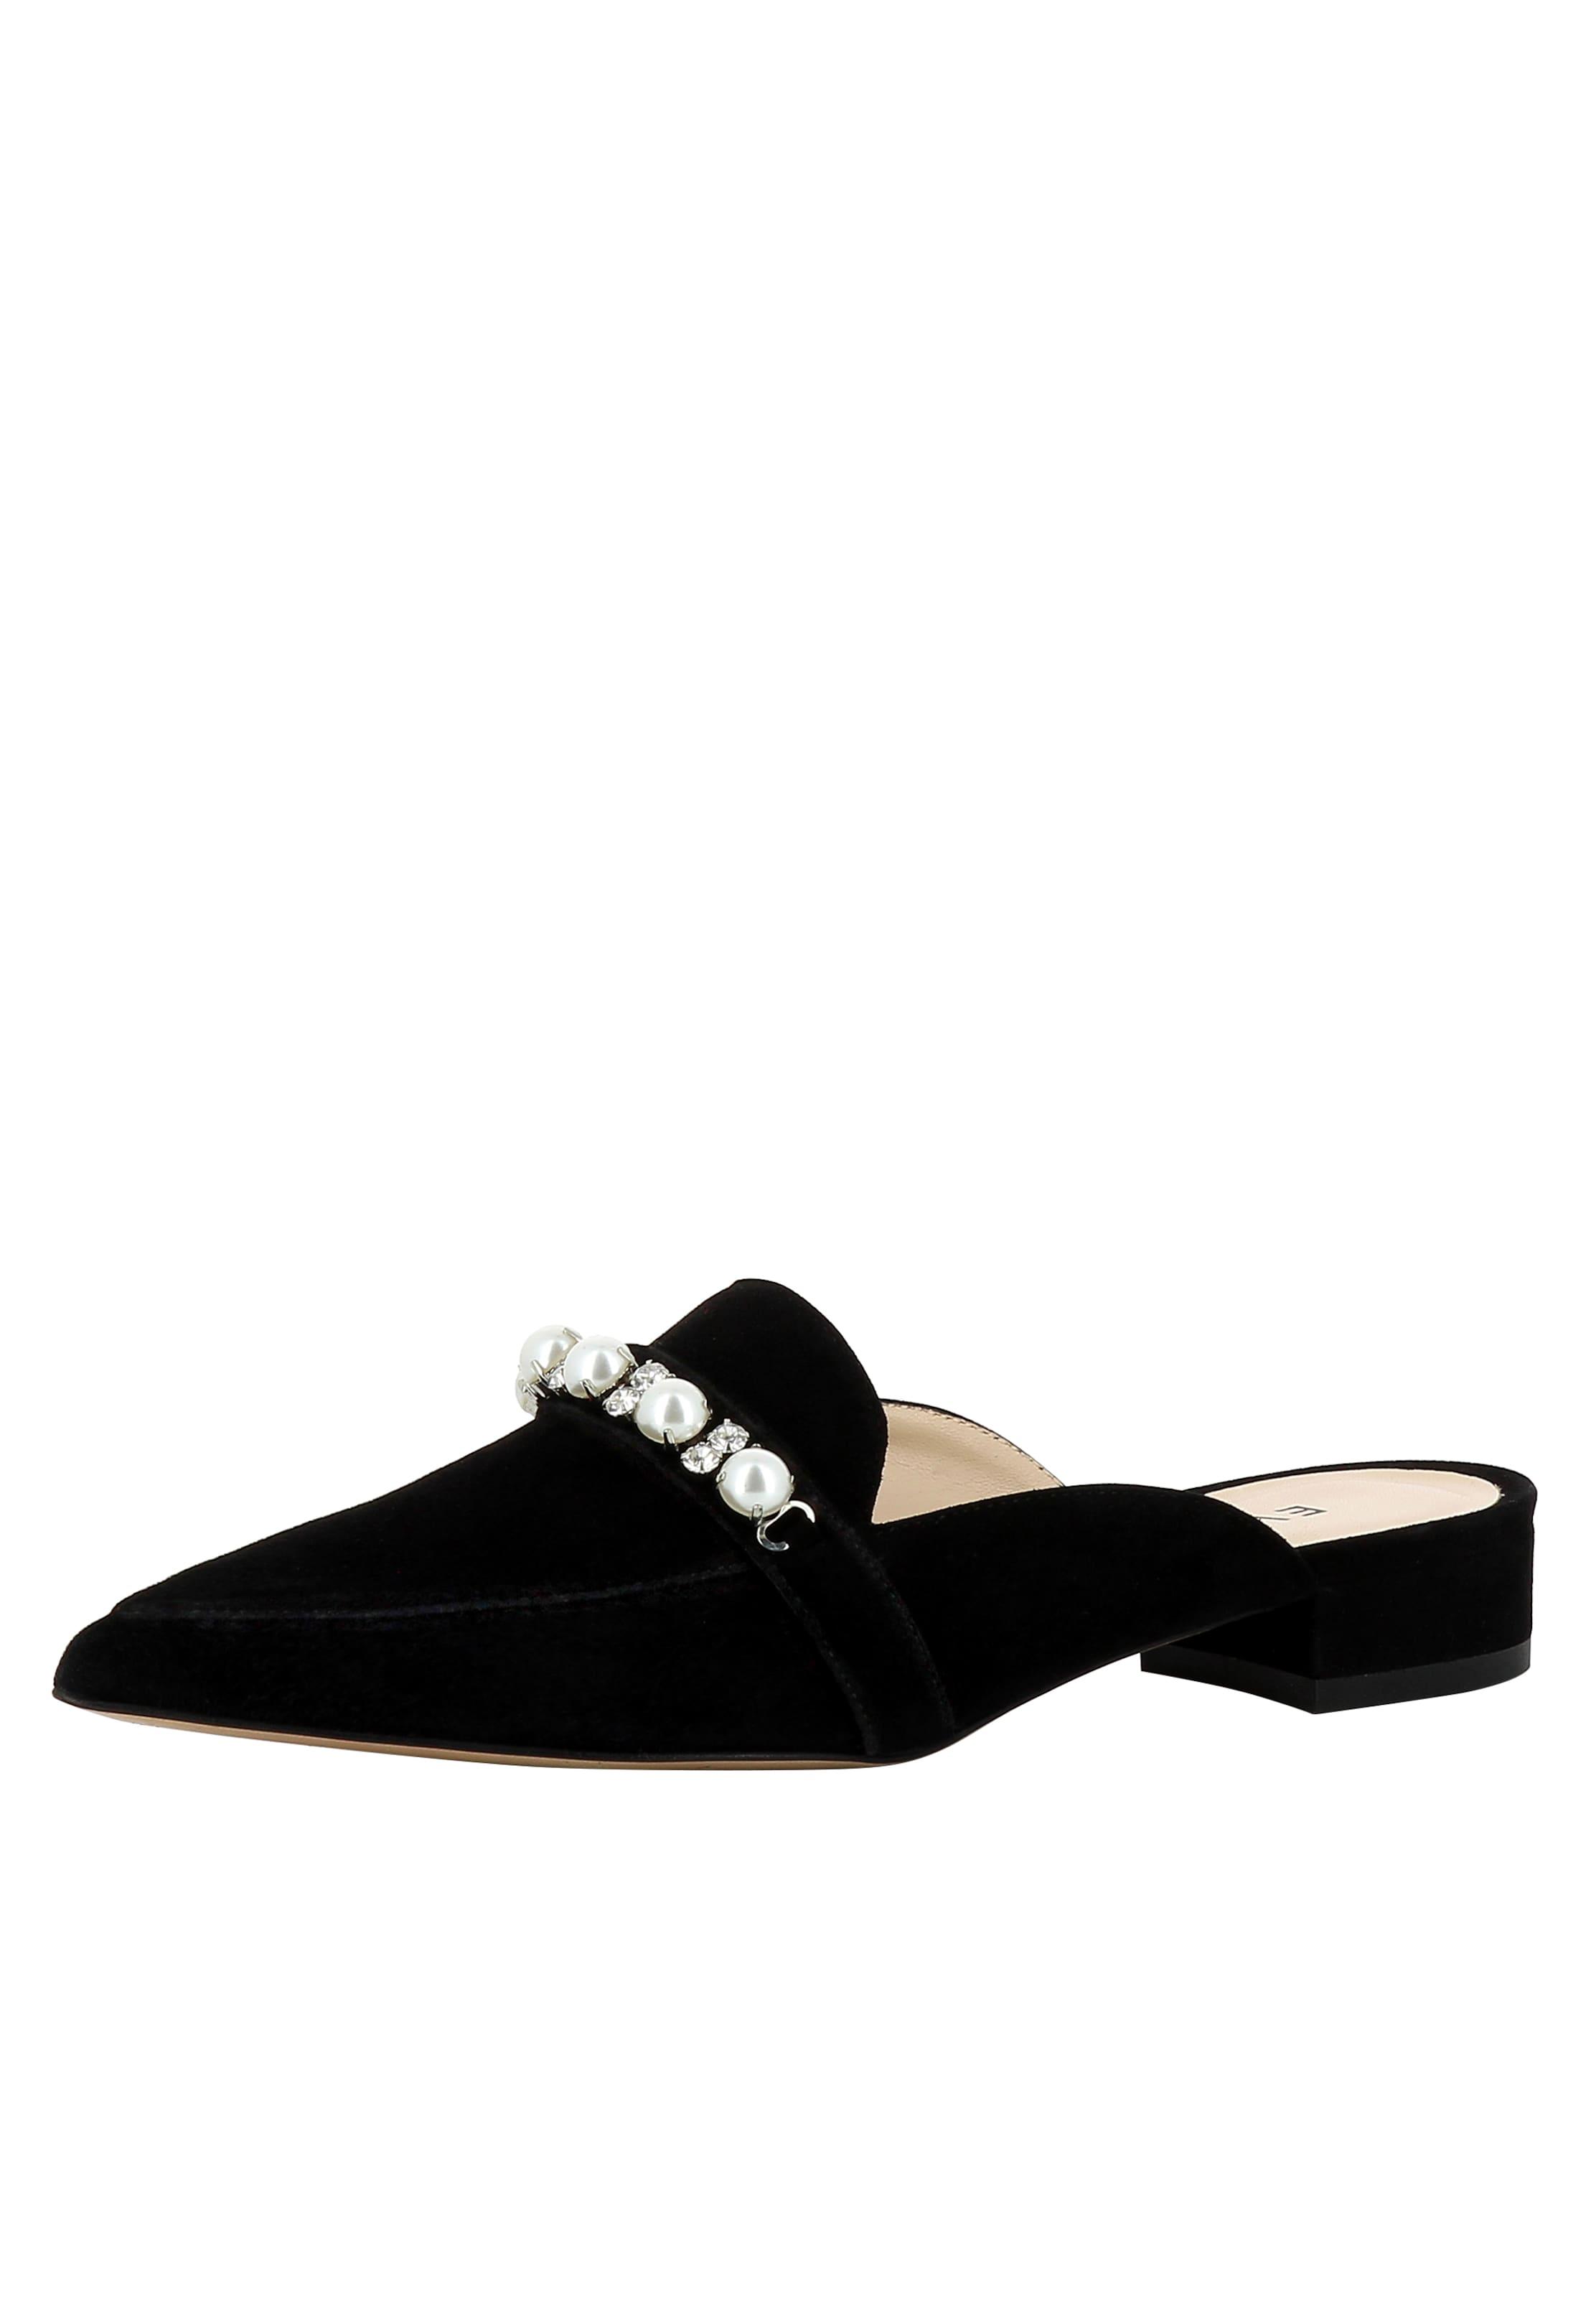 Haltbare Mode billige Pantolette Schuhe EVITA | Pantolette billige FRANCA Schuhe Gut getragene Schuhe d1b33f